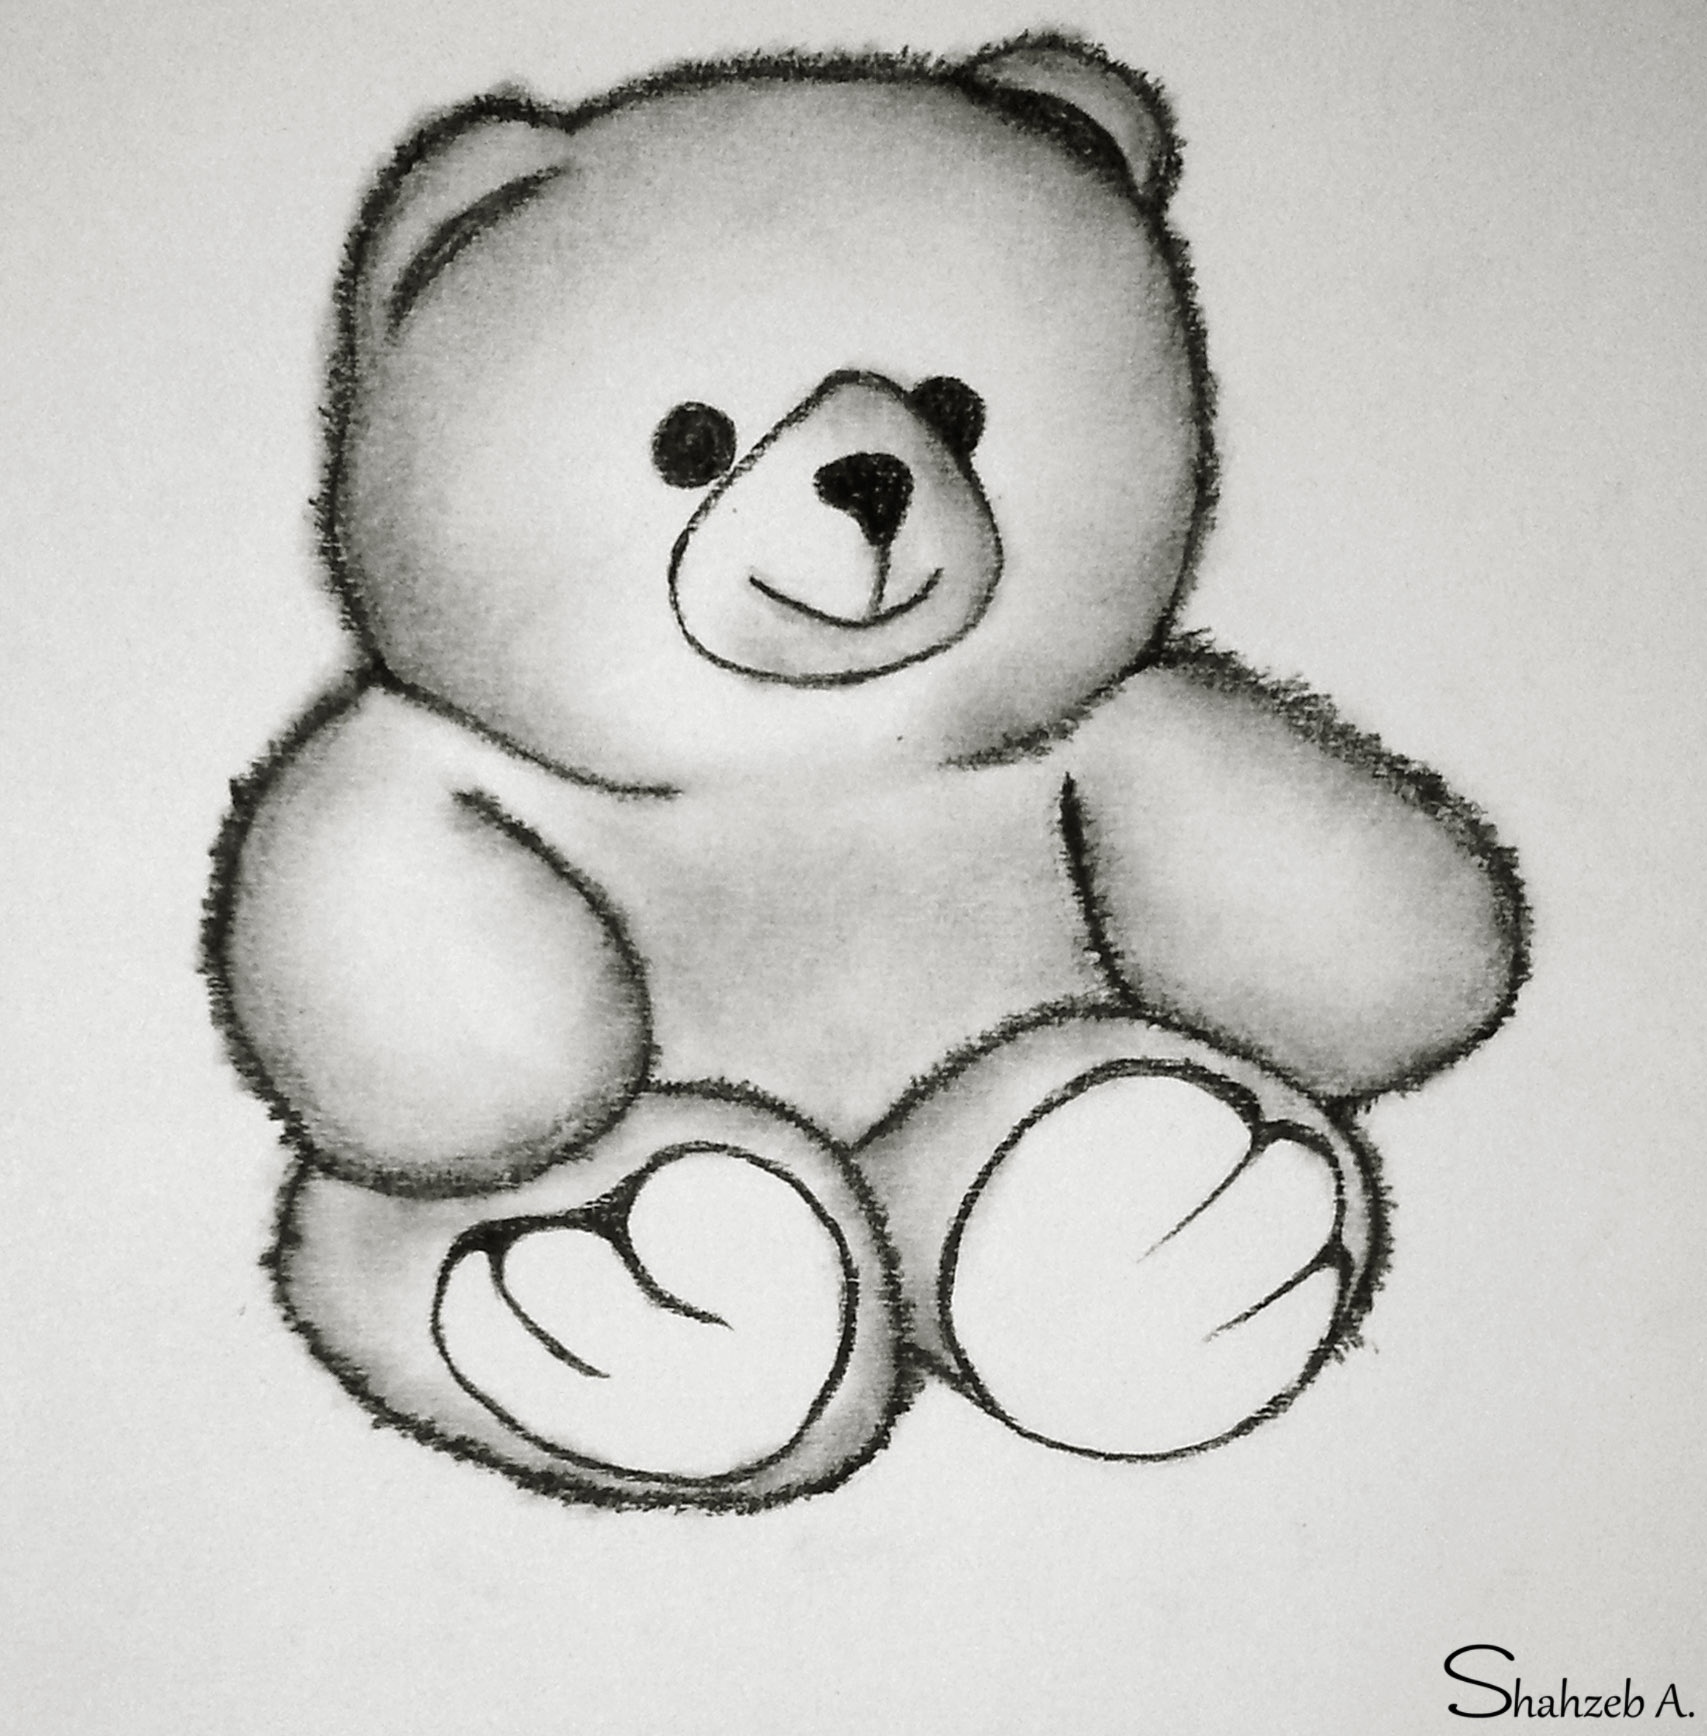 Uncategorized Drawings Of A Teddy Bear adorable teddy bear by shaixey on deviantart shaixey